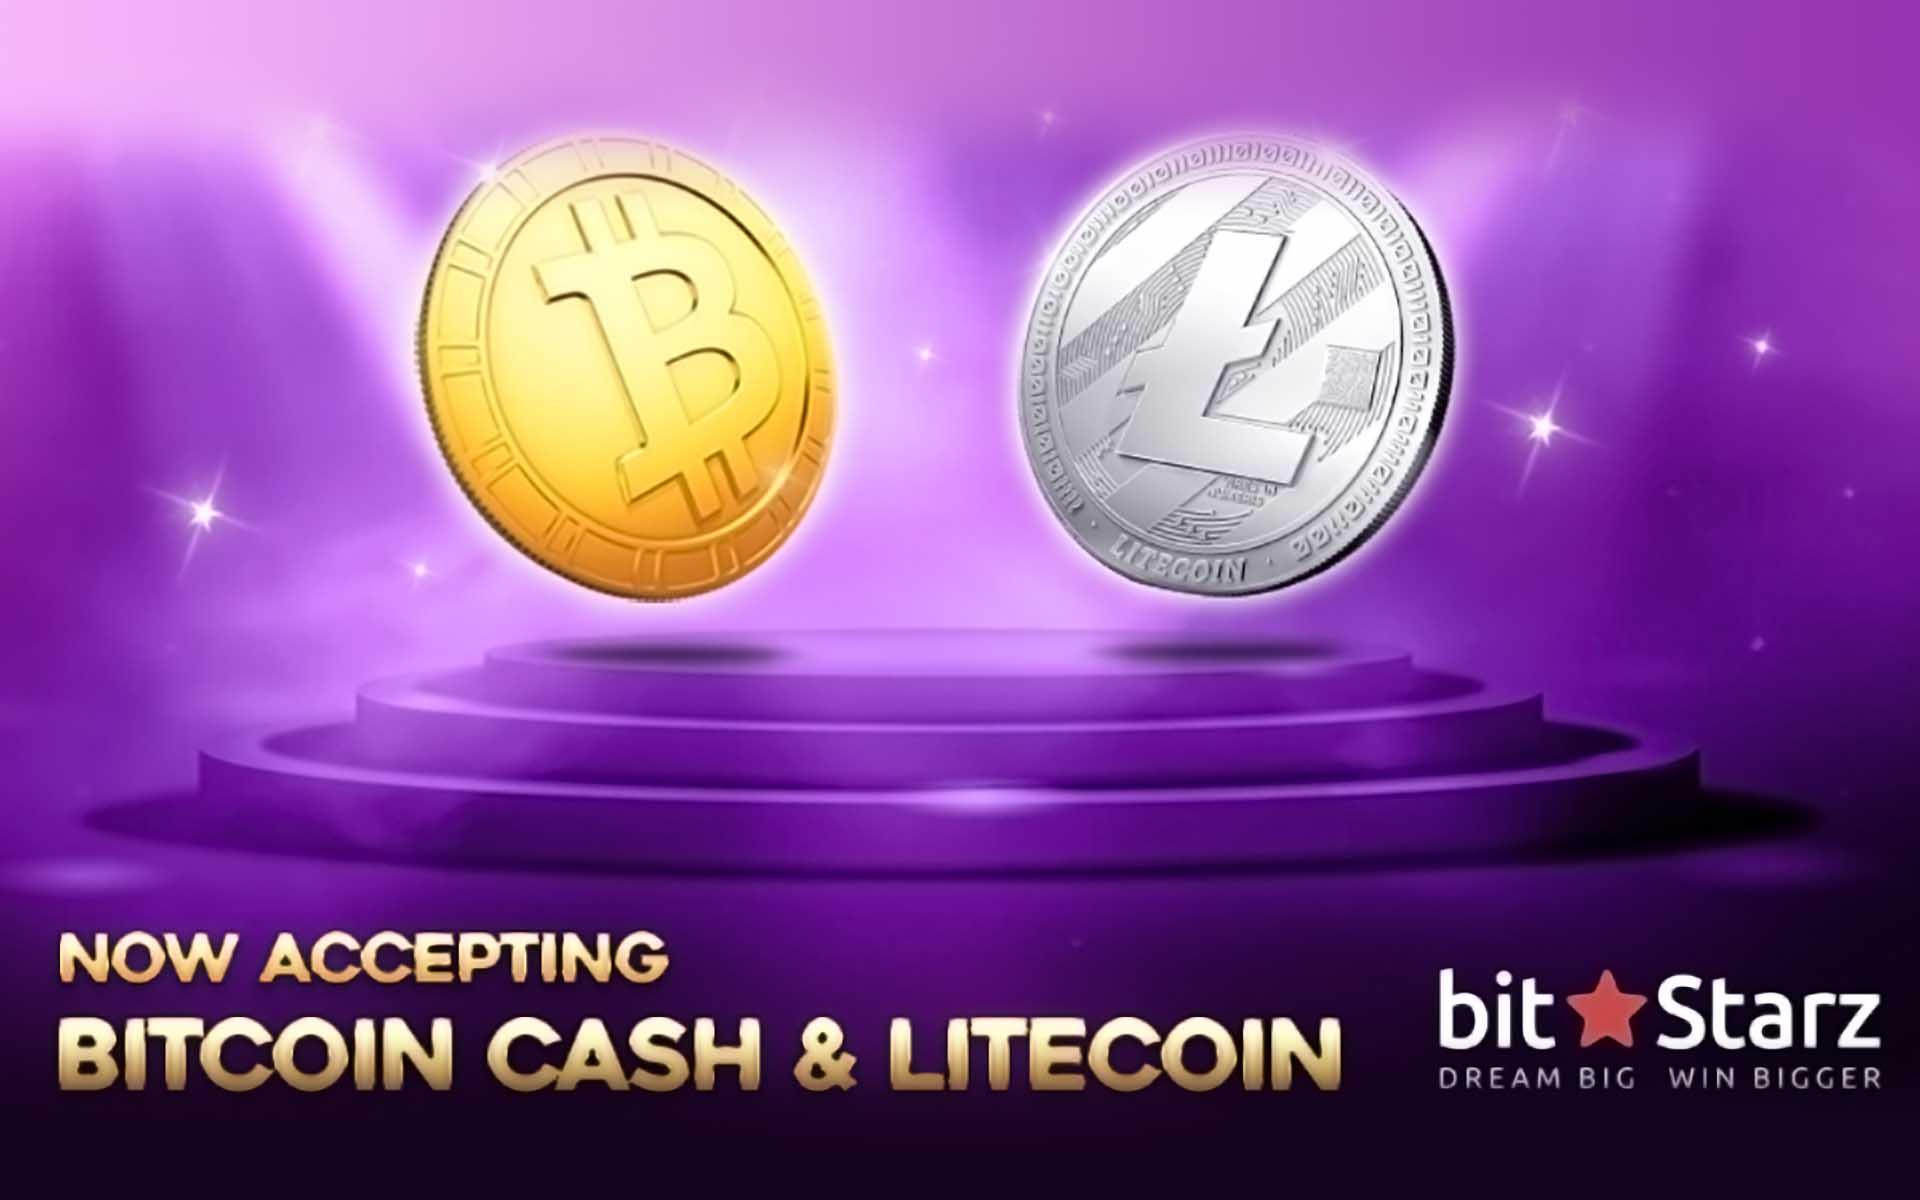 BitStarz Now Accepts Litecoin (LTC) and Bitcoin Cash (BCH)